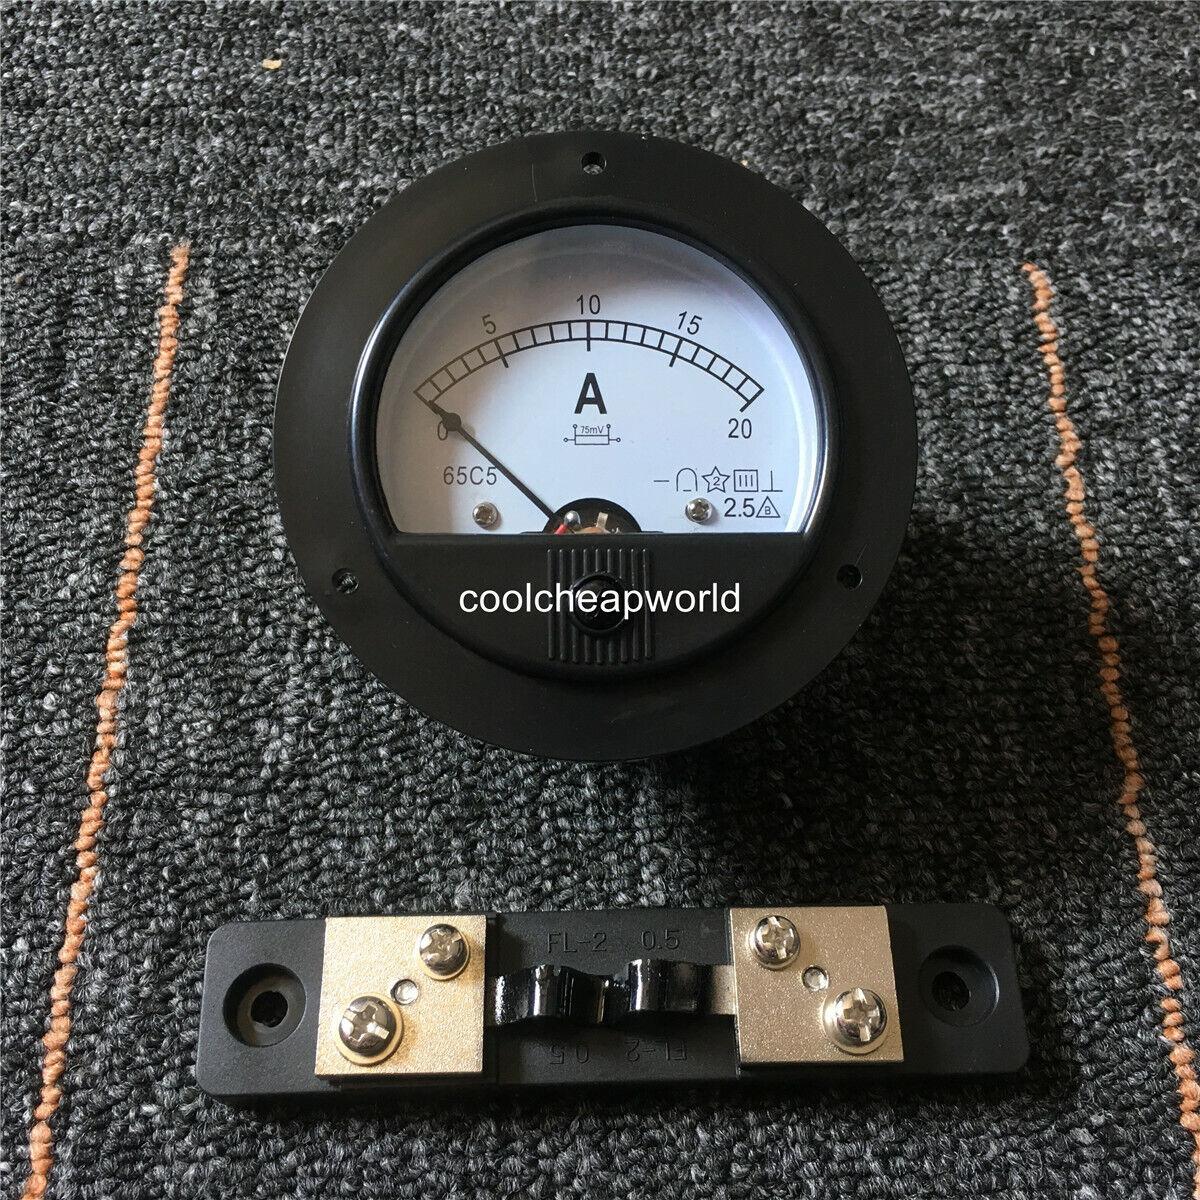 Brand New DC 200A 65C5 Free Shipping Analog AMP Panel Meter